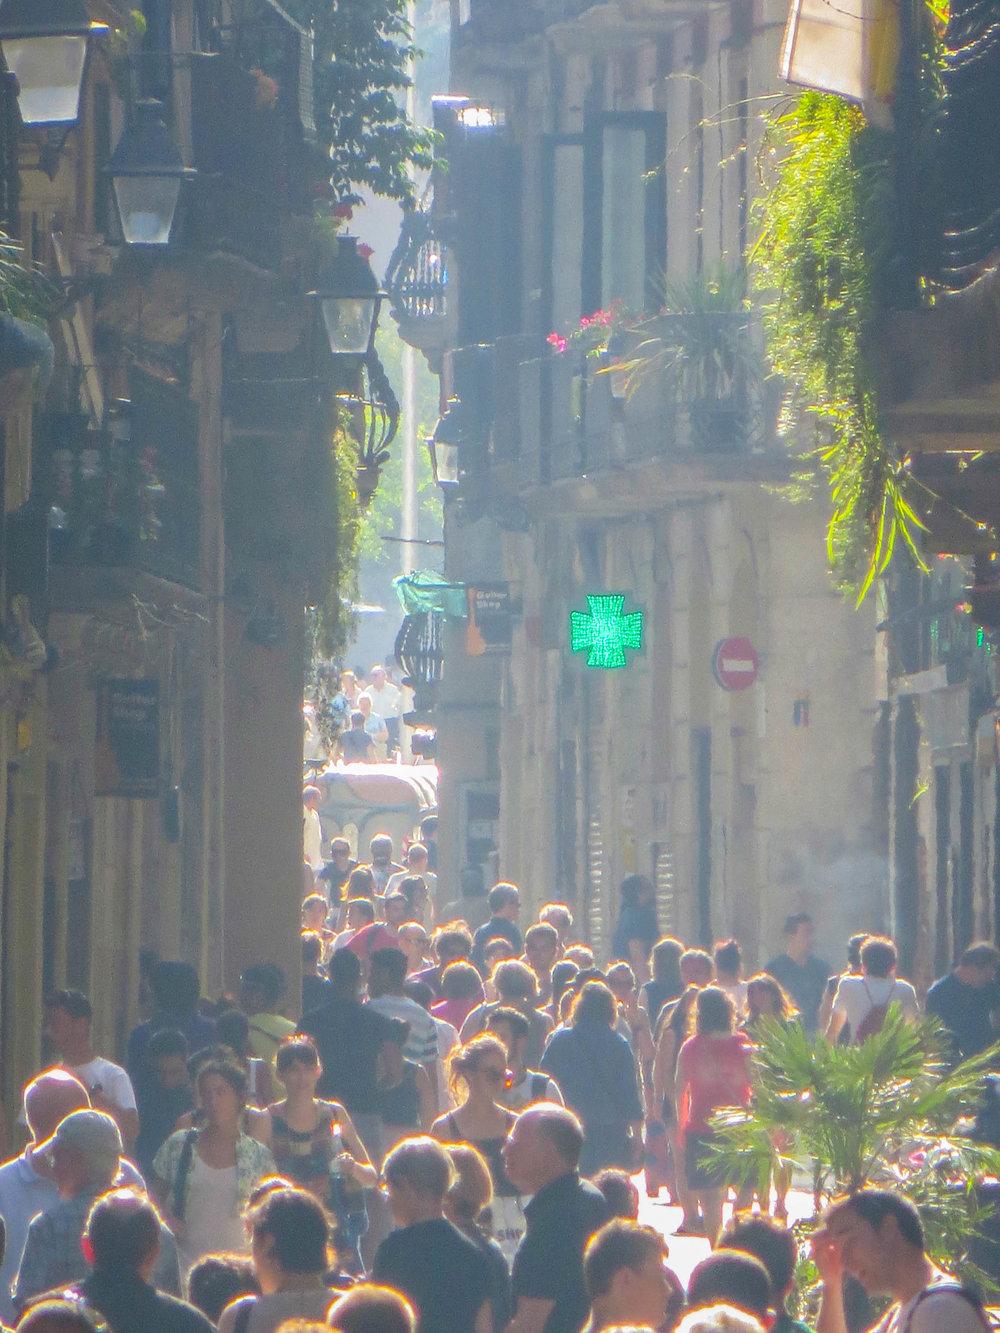 barcelona-spain-catalonia-22.jpg